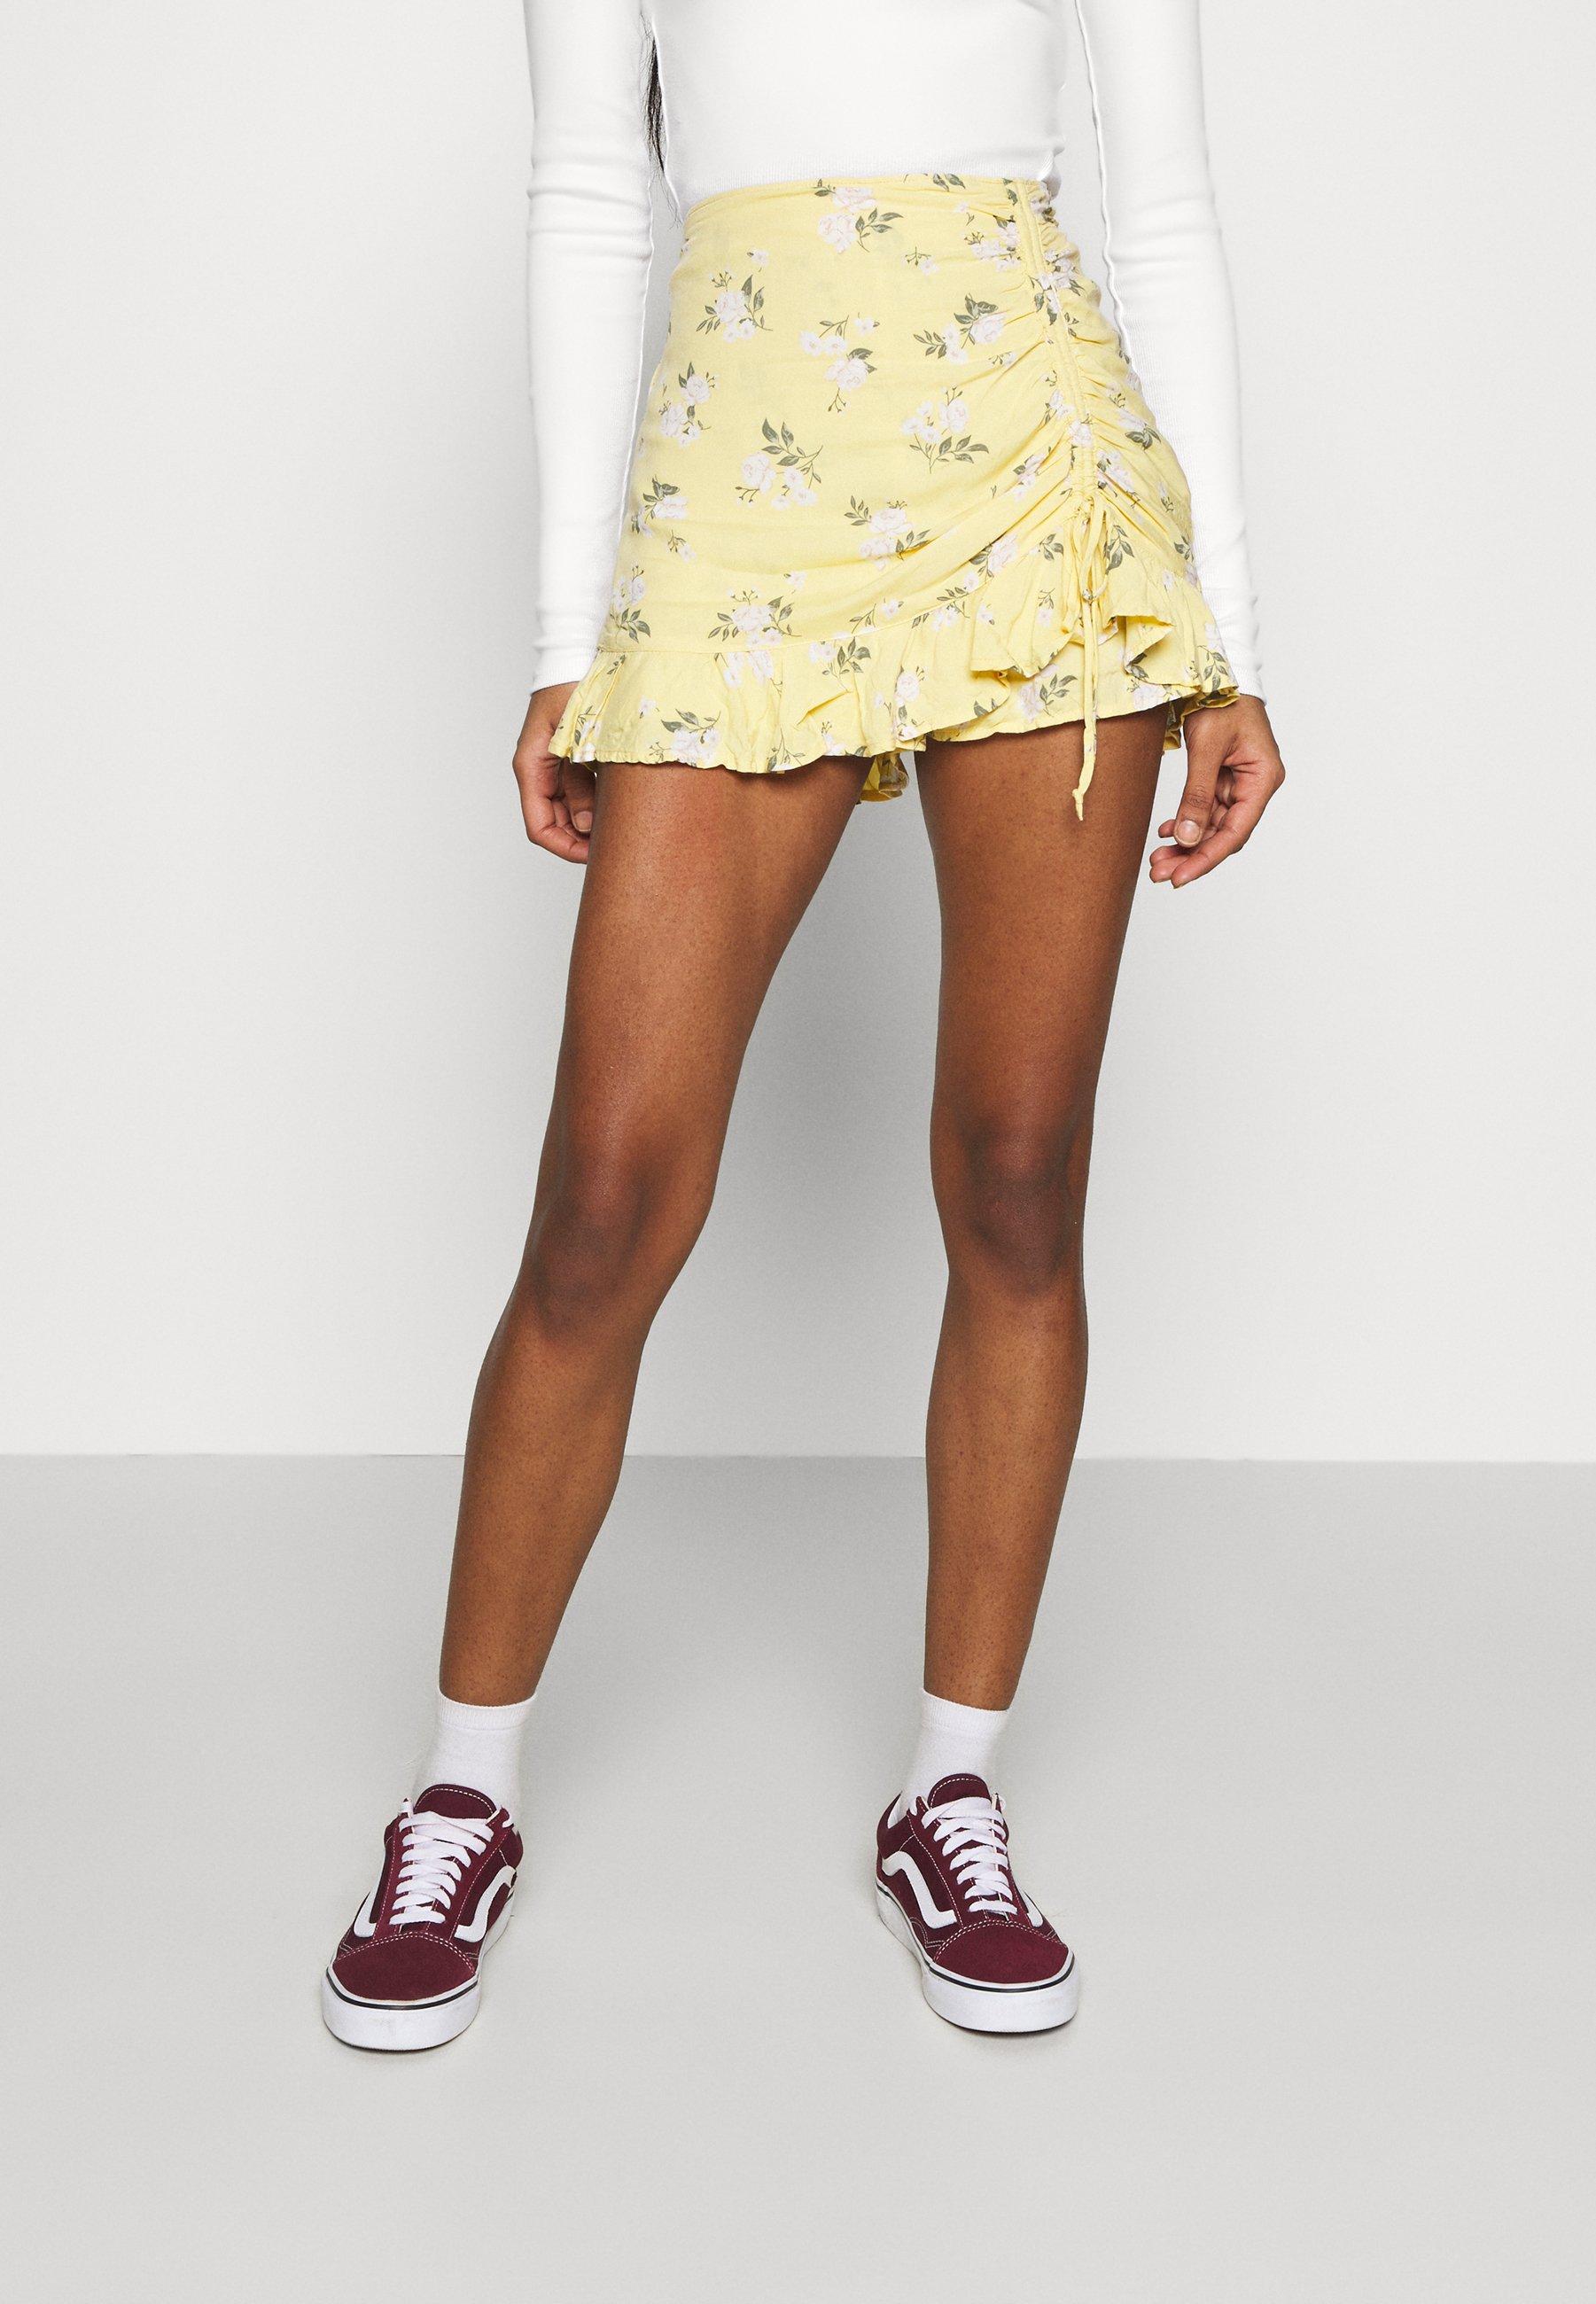 Femme RUFFLE SKORT - Short - yellow